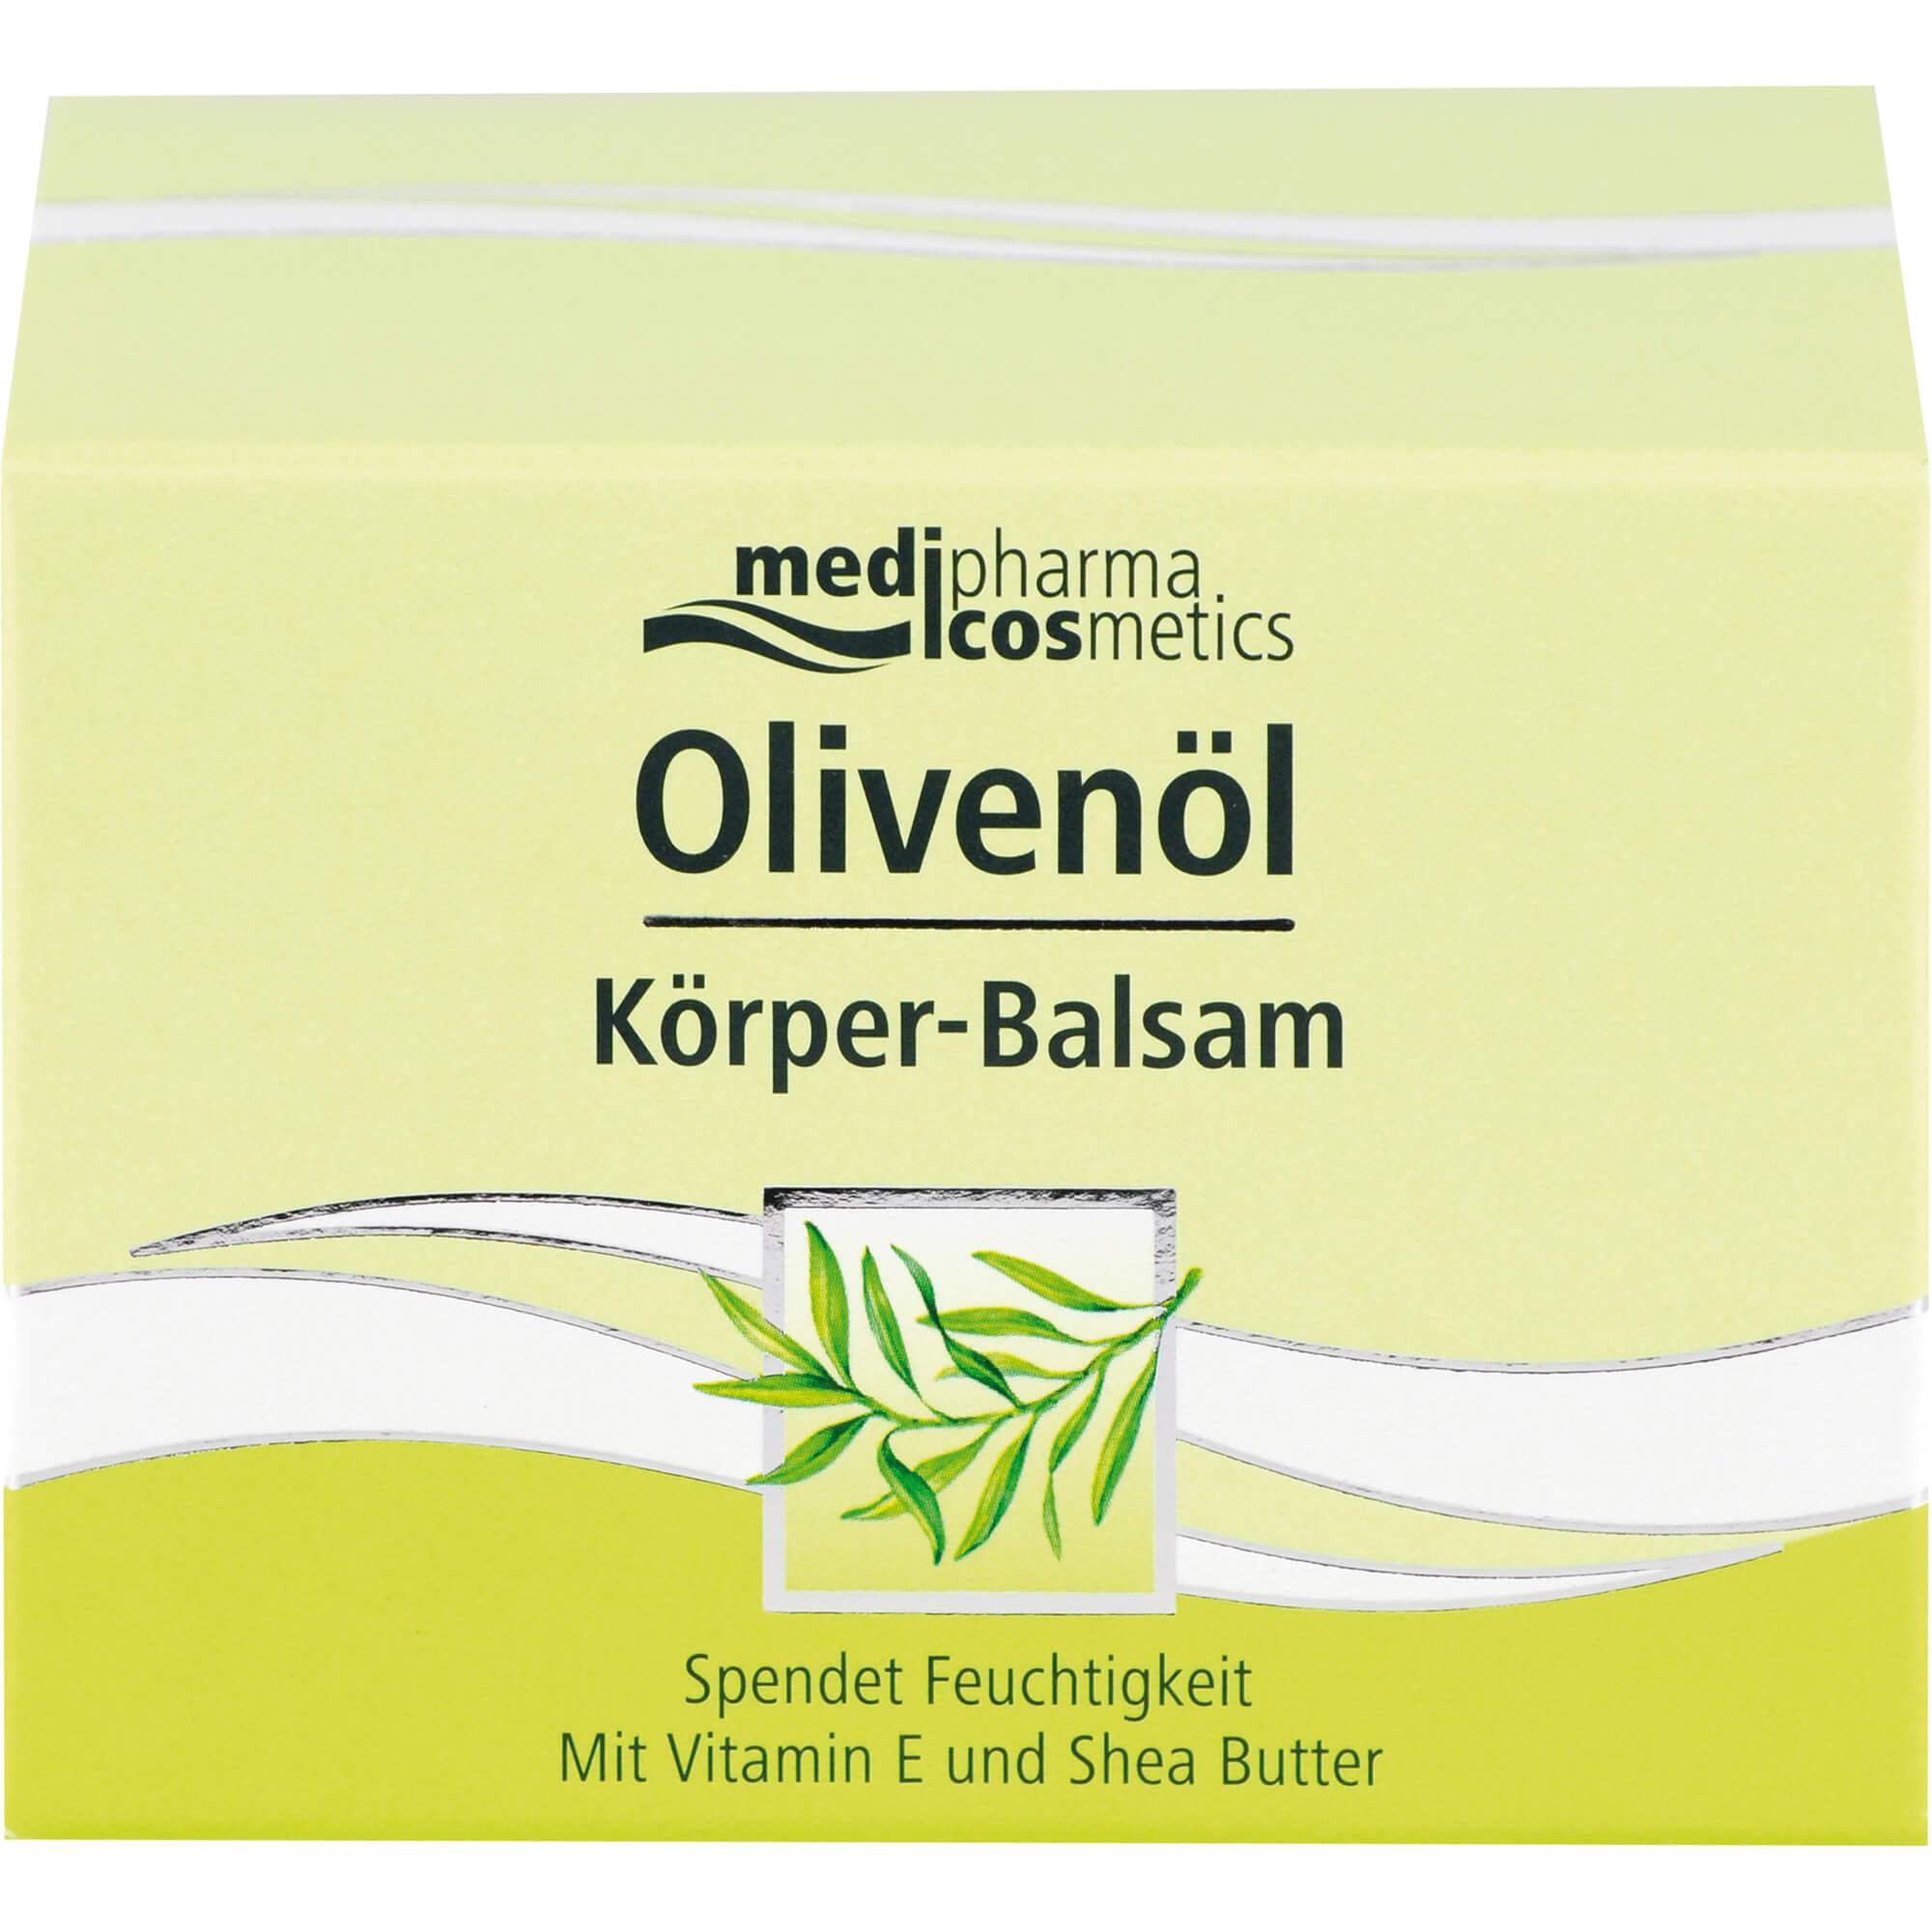 OLIVENOeL-KOeRPERBALSAM